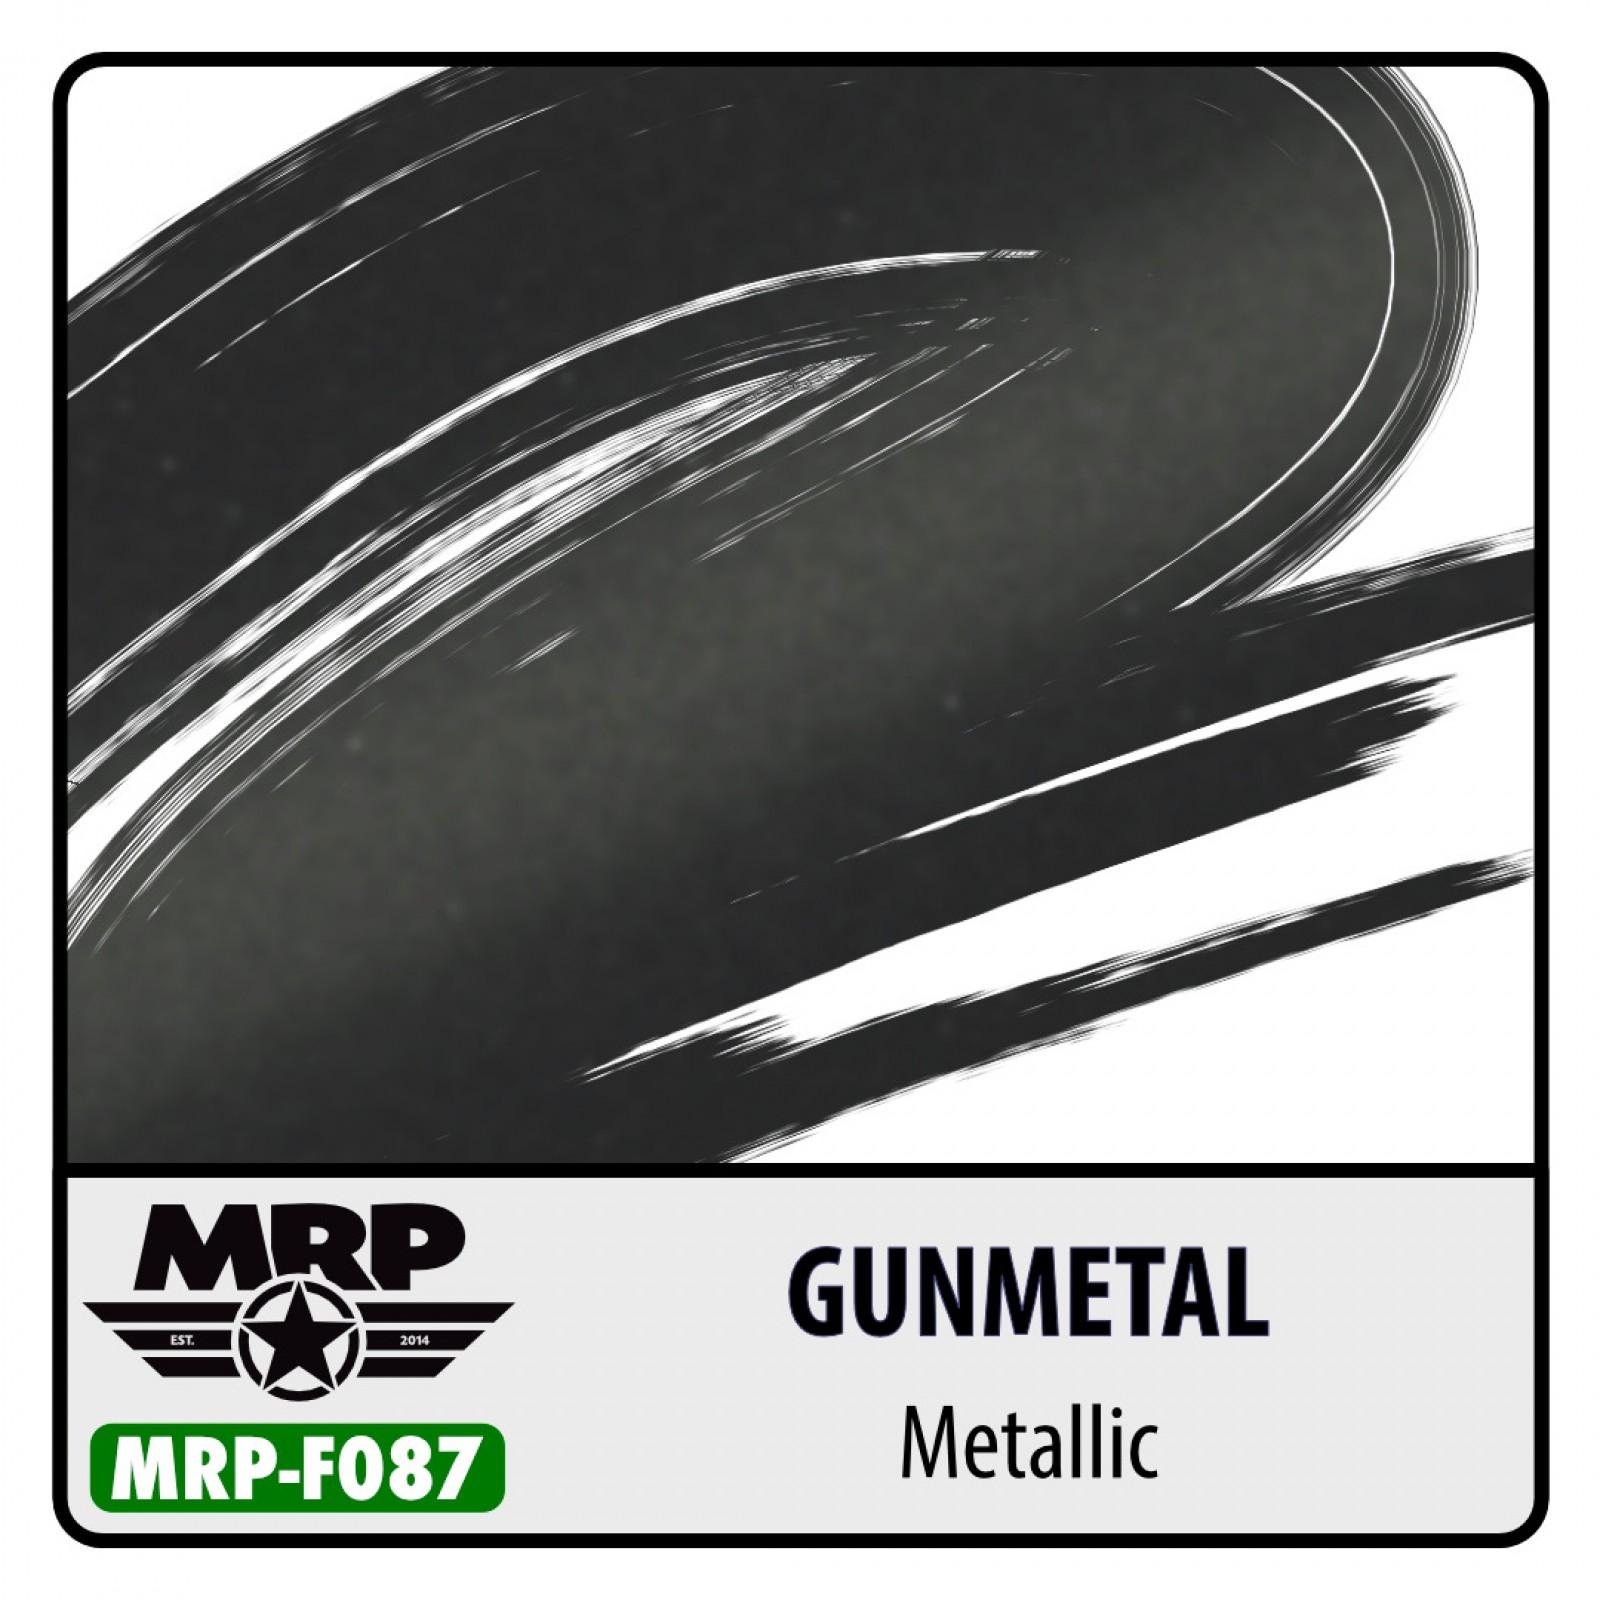 MRP-F087  GUNMETAL